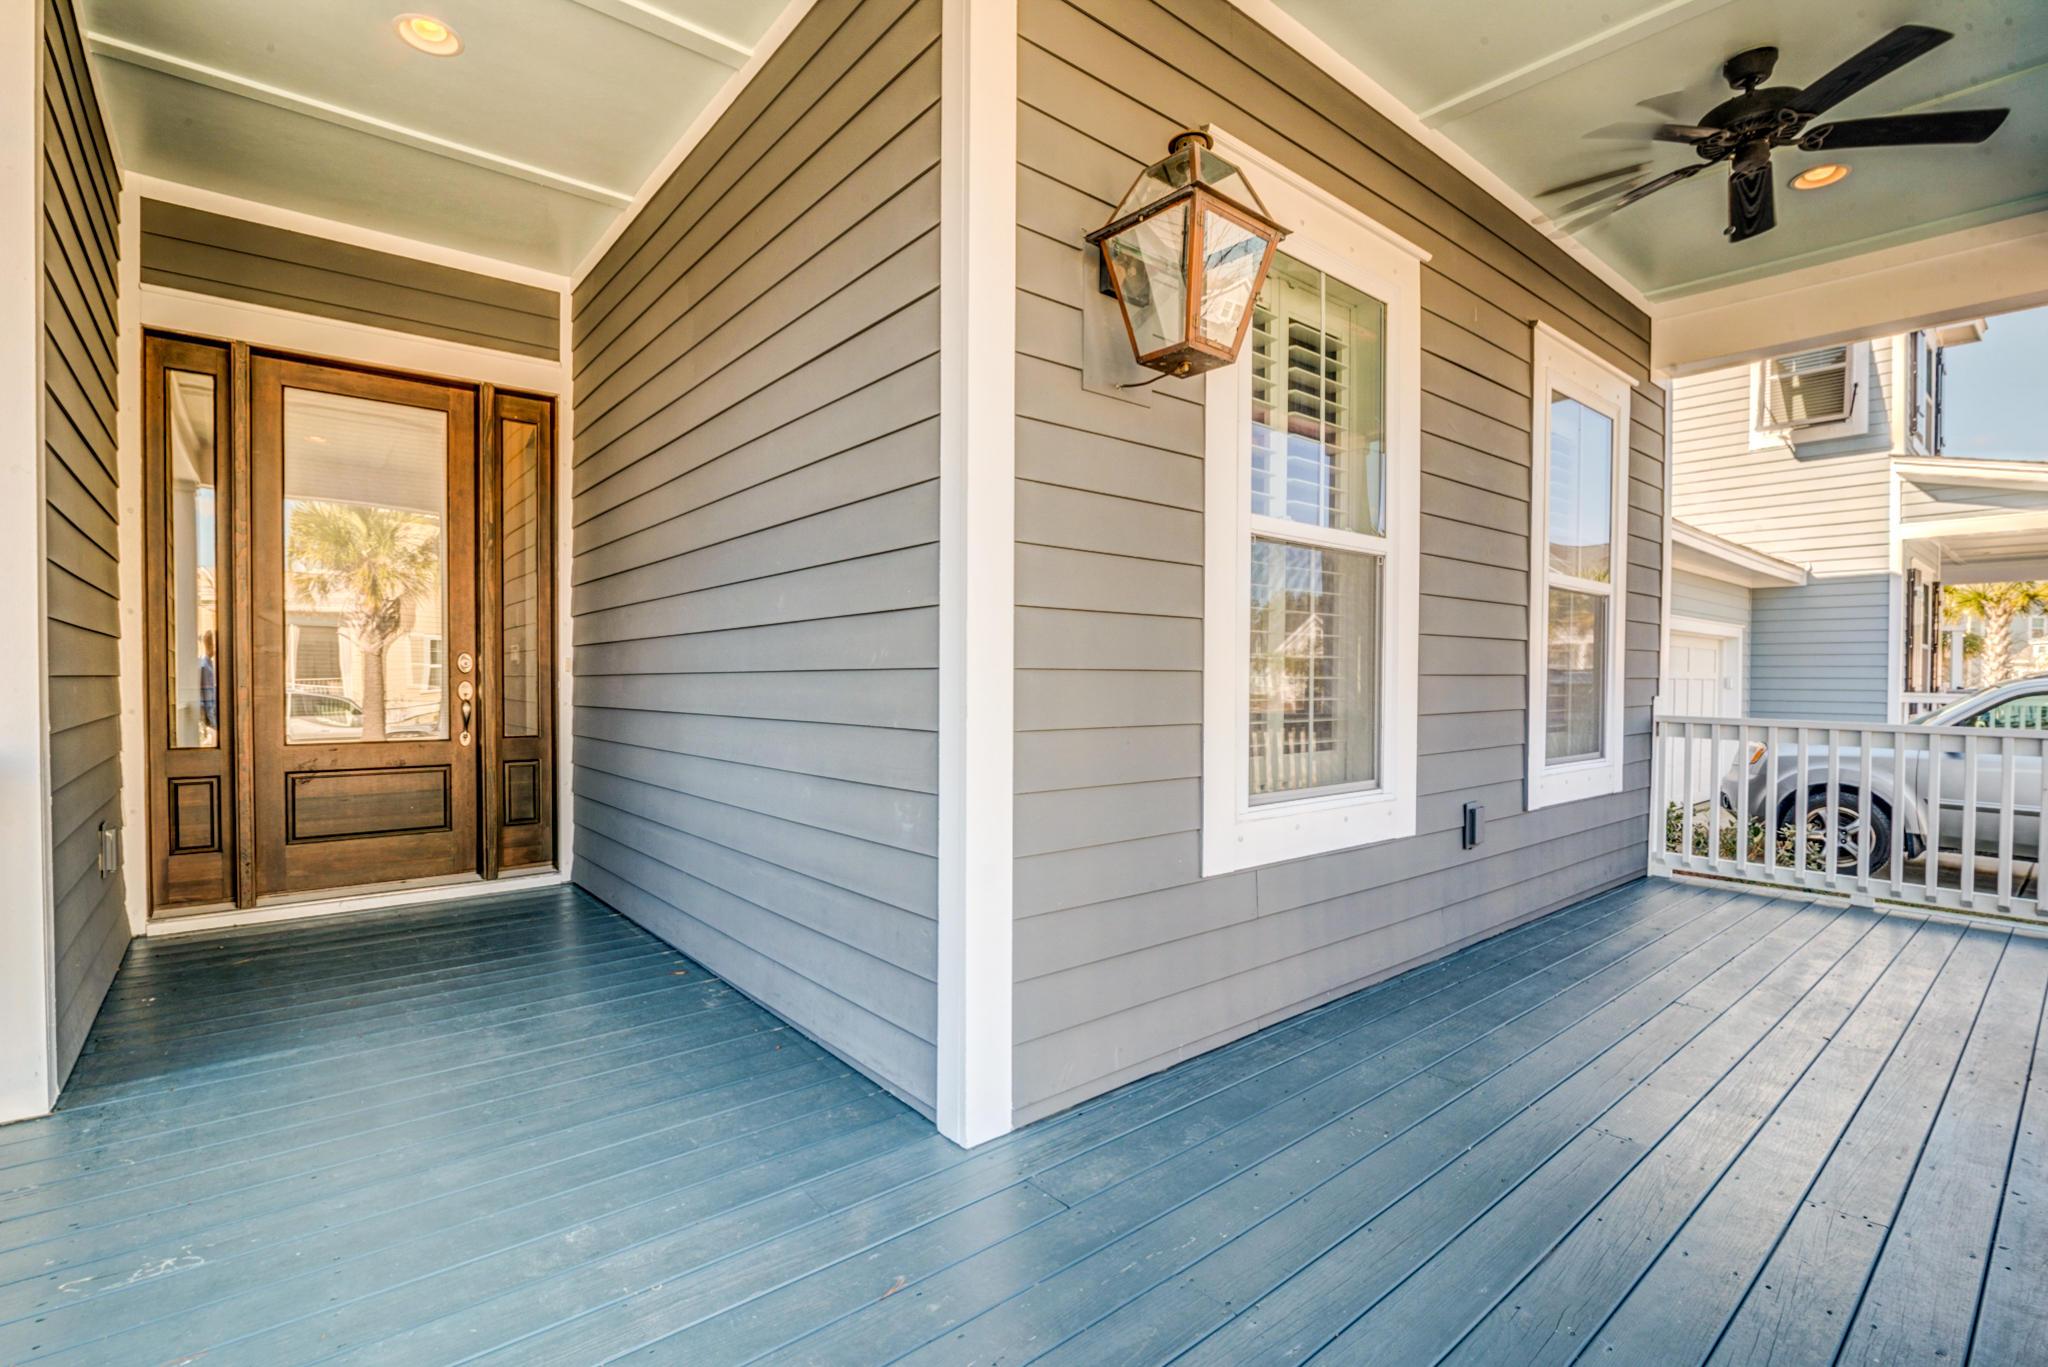 Carolina Park Homes For Sale - 3687 Spindrift, Mount Pleasant, SC - 16